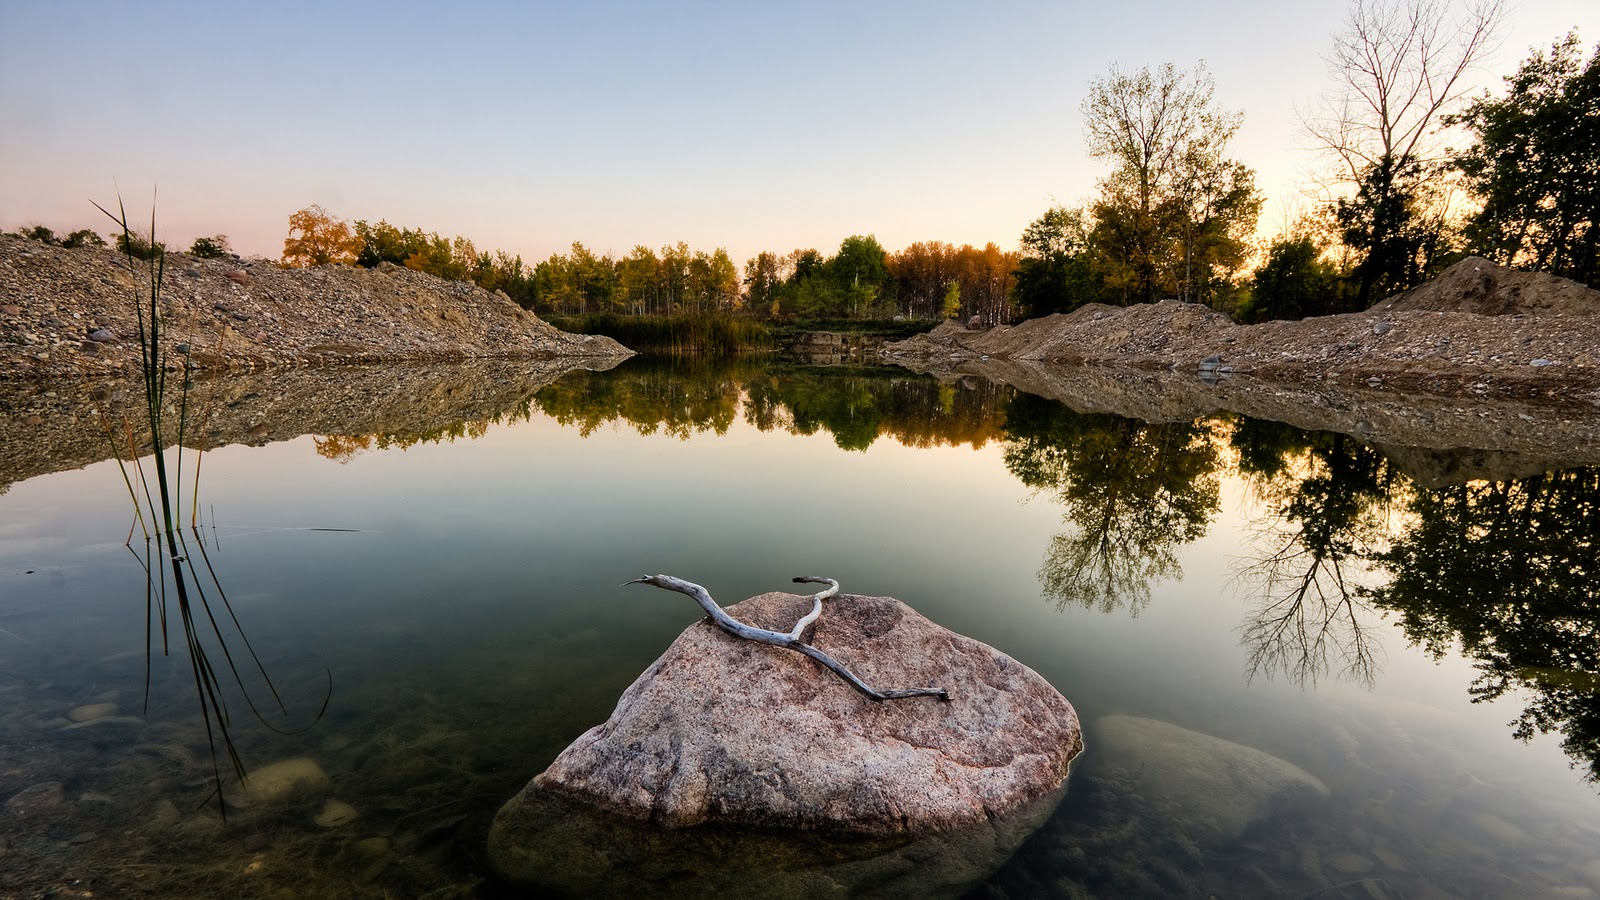 44 tane 1080p hd manzara resimleri 1080p hd nature for Image nature hd gratuit